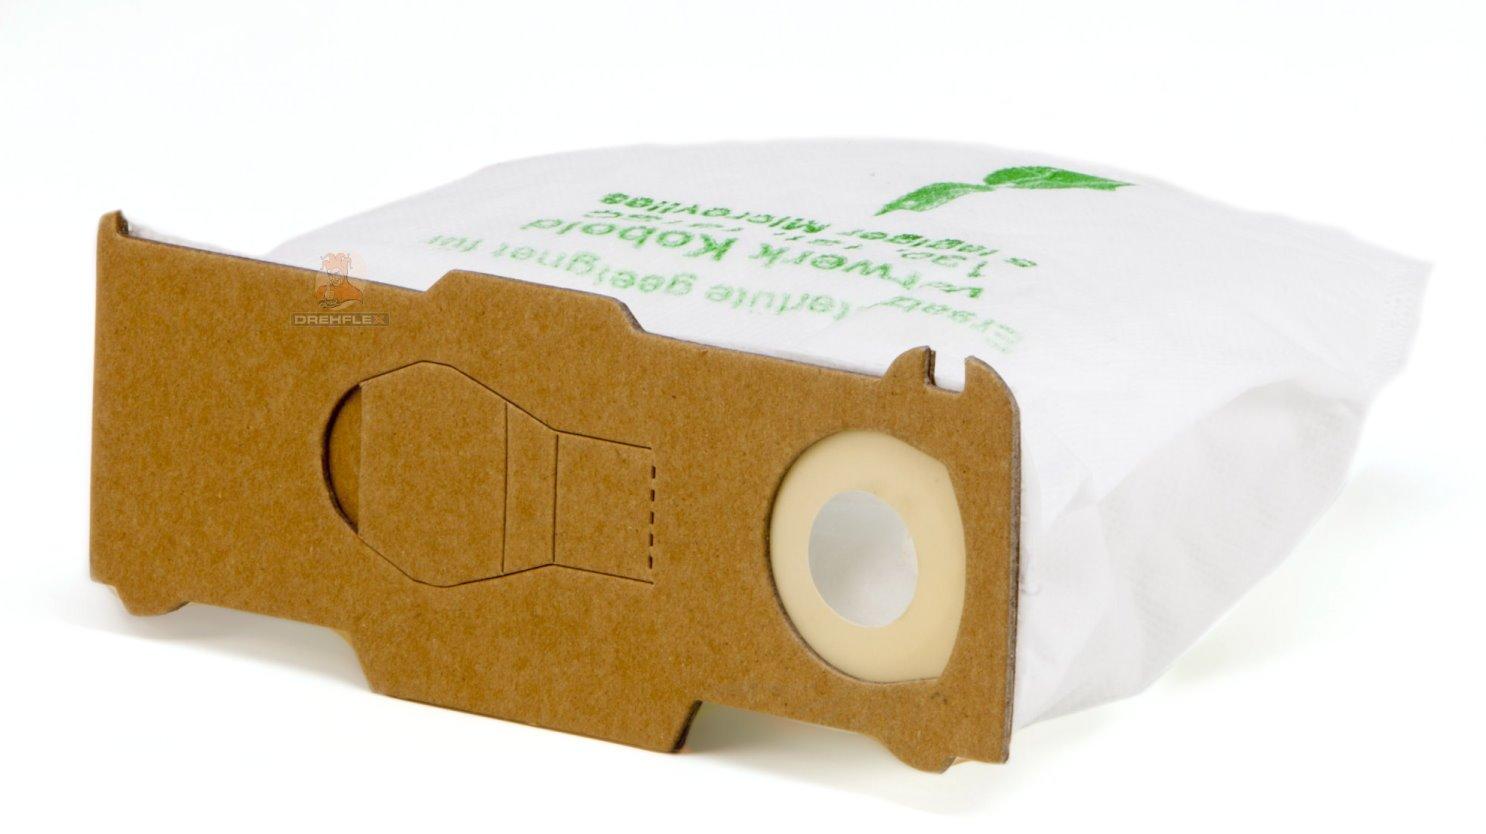 DREHFLEX®–6Sacchetti per aspirapolvere in tessuto non tessuto adatto per Vorwerk–folletto Vk 130/131/131sc/VK130/VK131–Drehflex® SB811